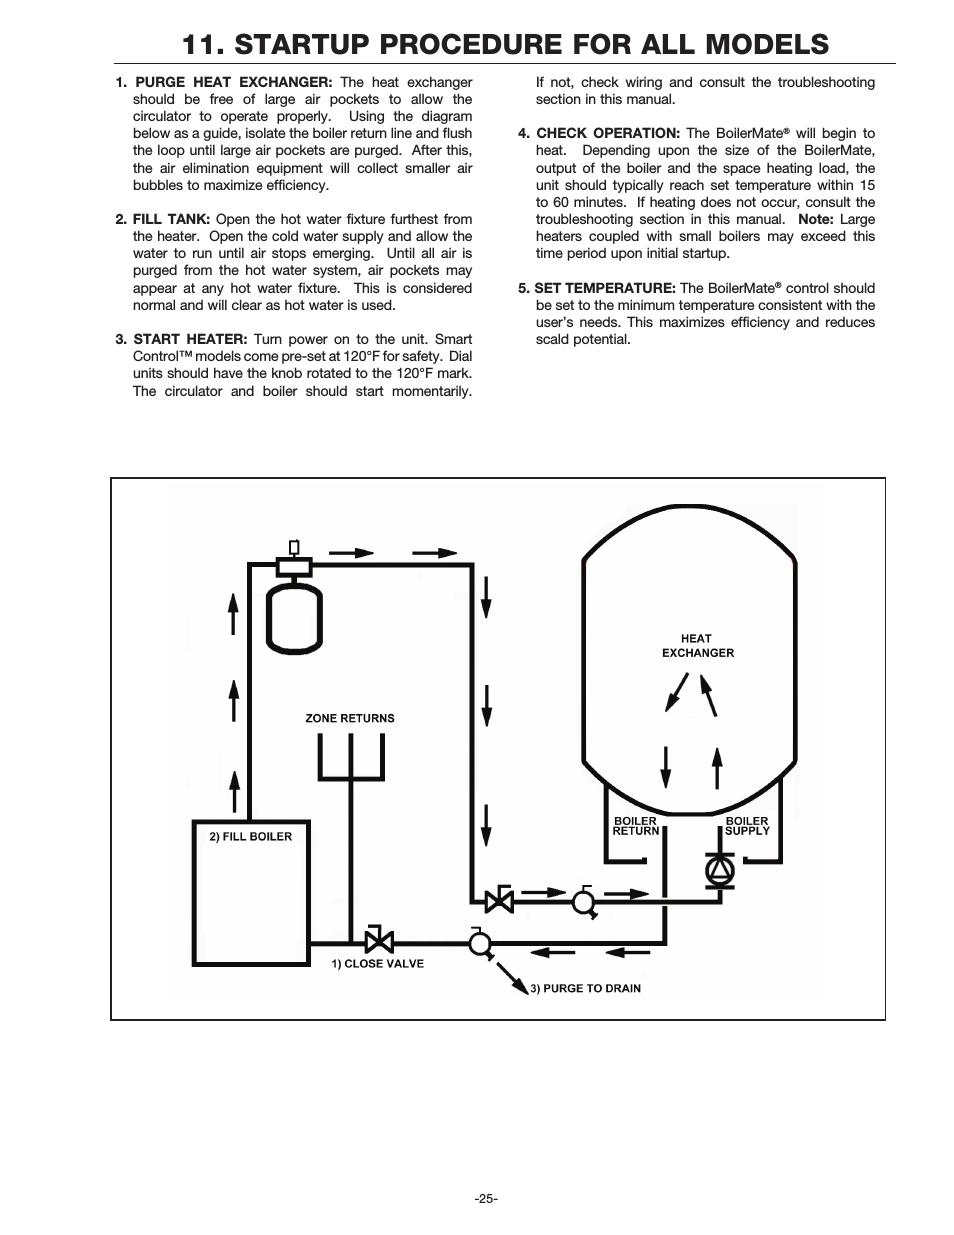 NE_1133] Boilermate Wiring Diagram Free DiagramAriot Pap Mohammedshrine Librar Wiring 101